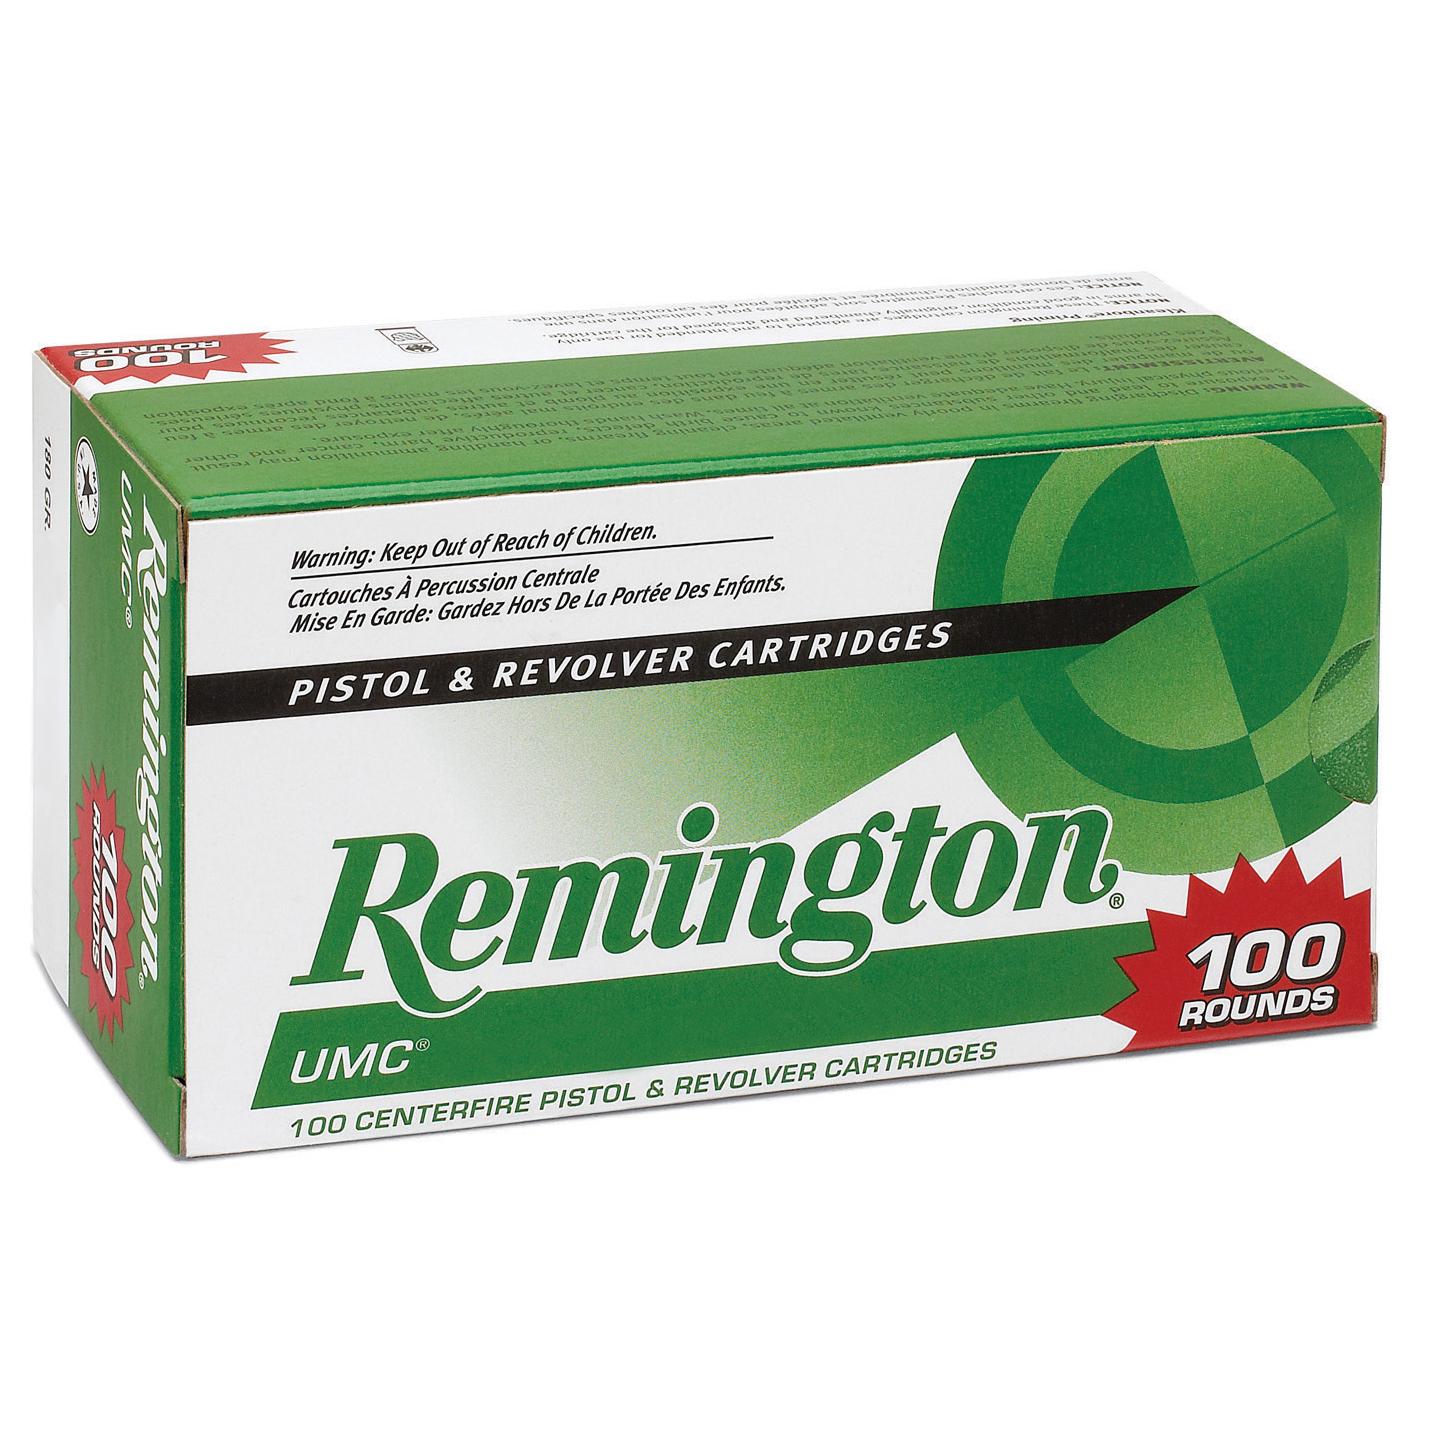 Remington UMC Handgun Ammunition Value Pack, 9mm Luger, 115-gr, FMJ, 100 Rounds